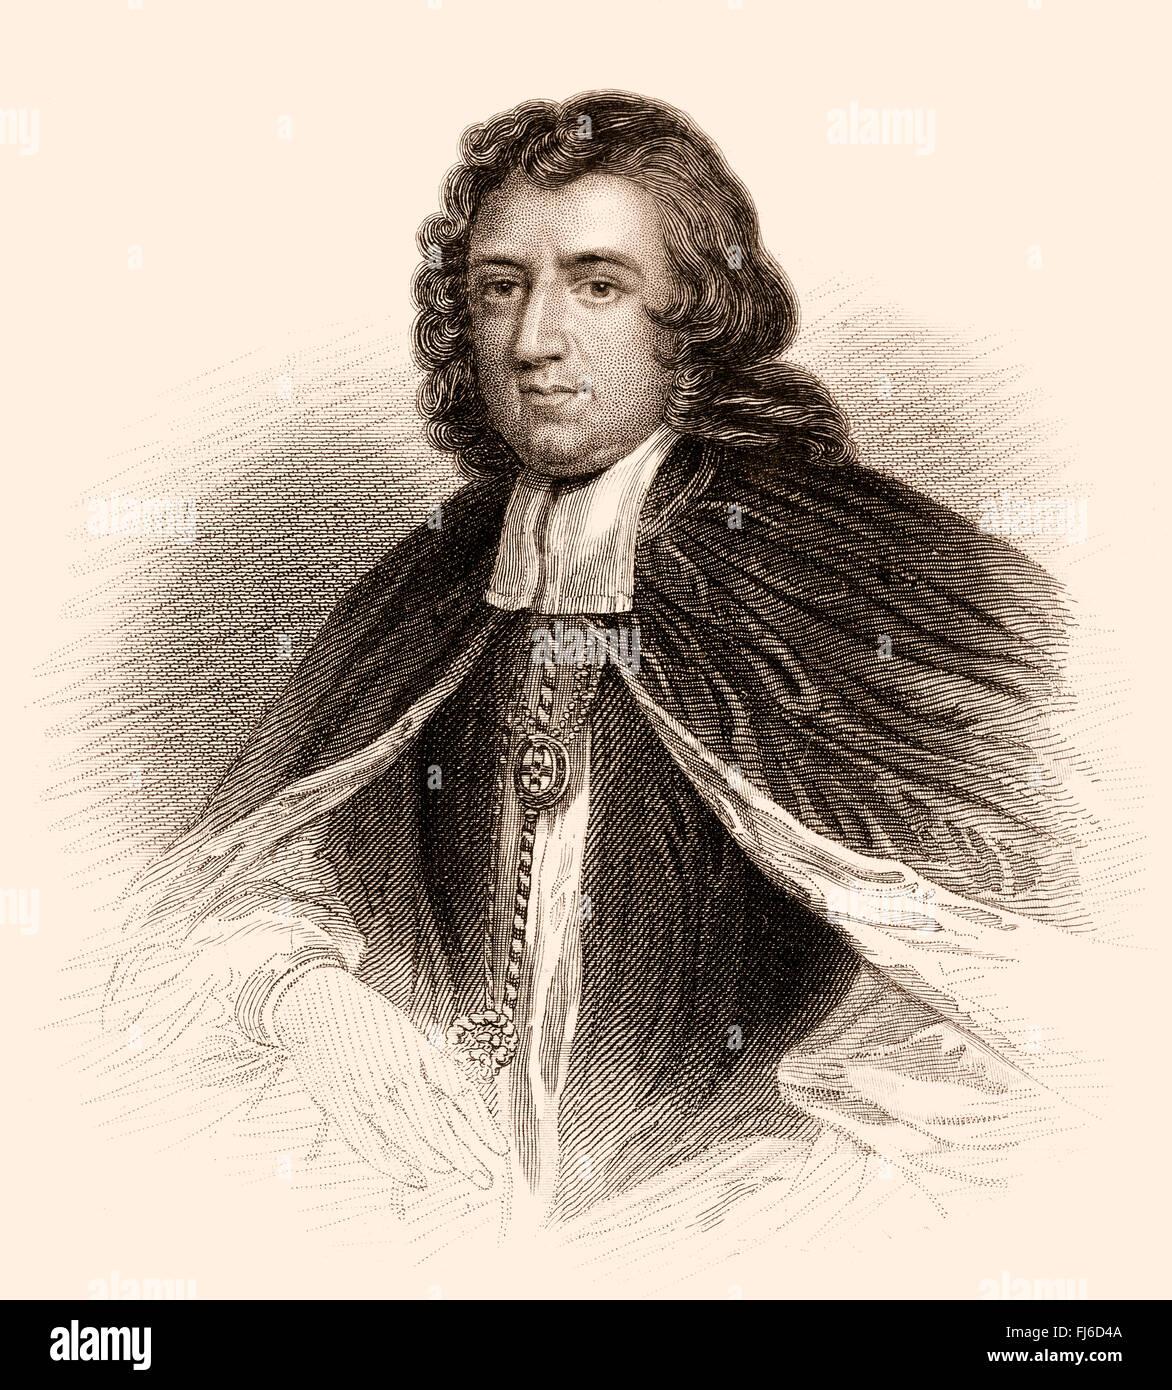 Gilbert Burnet, 1643-1715, a Scottish philosopher and historian, Bishop of Salisbury - Stock Image